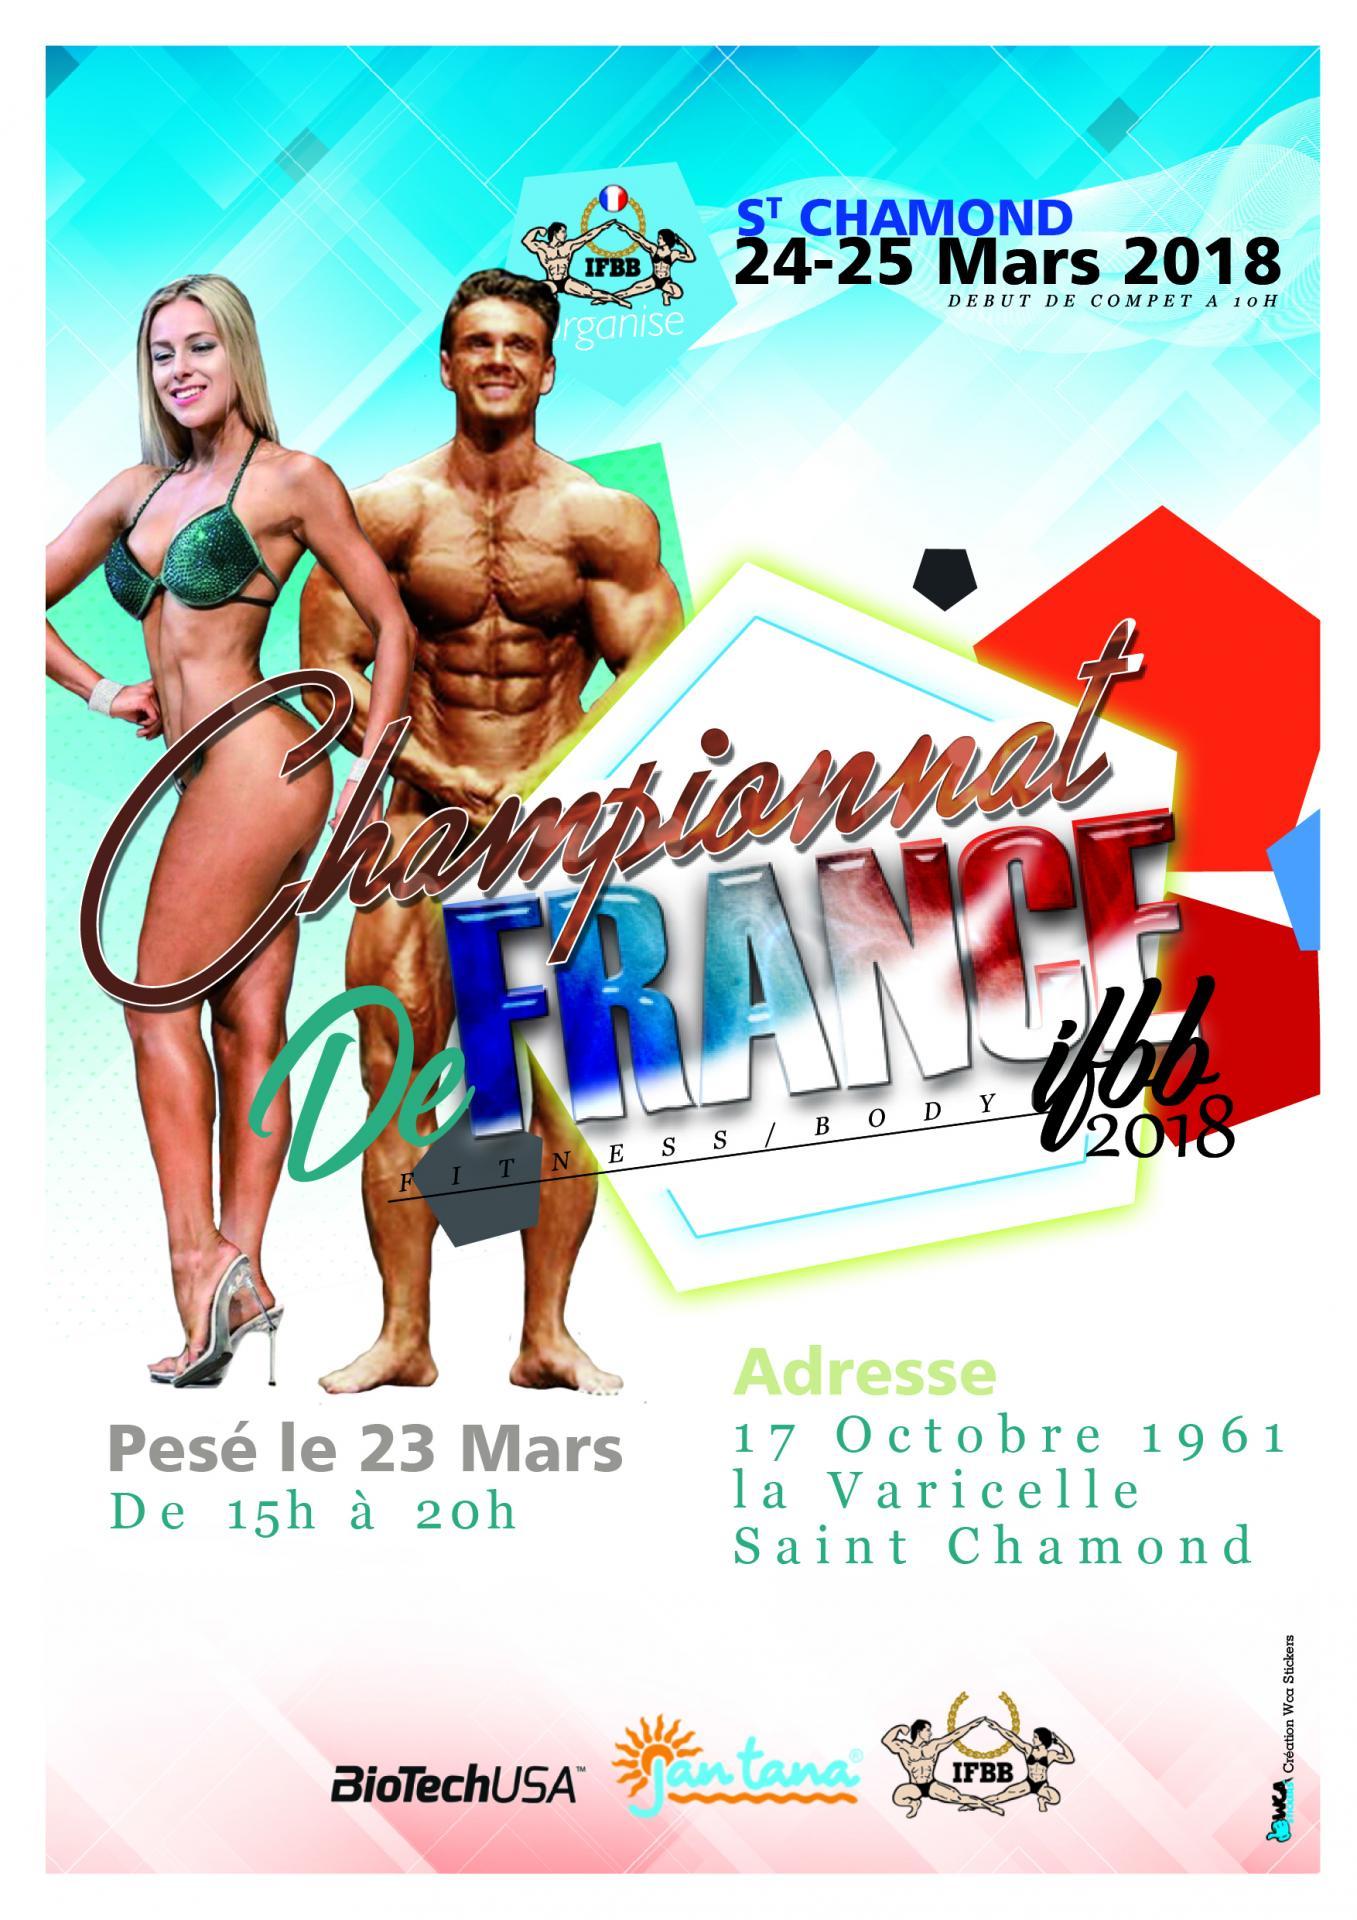 Ifbb final france 2018